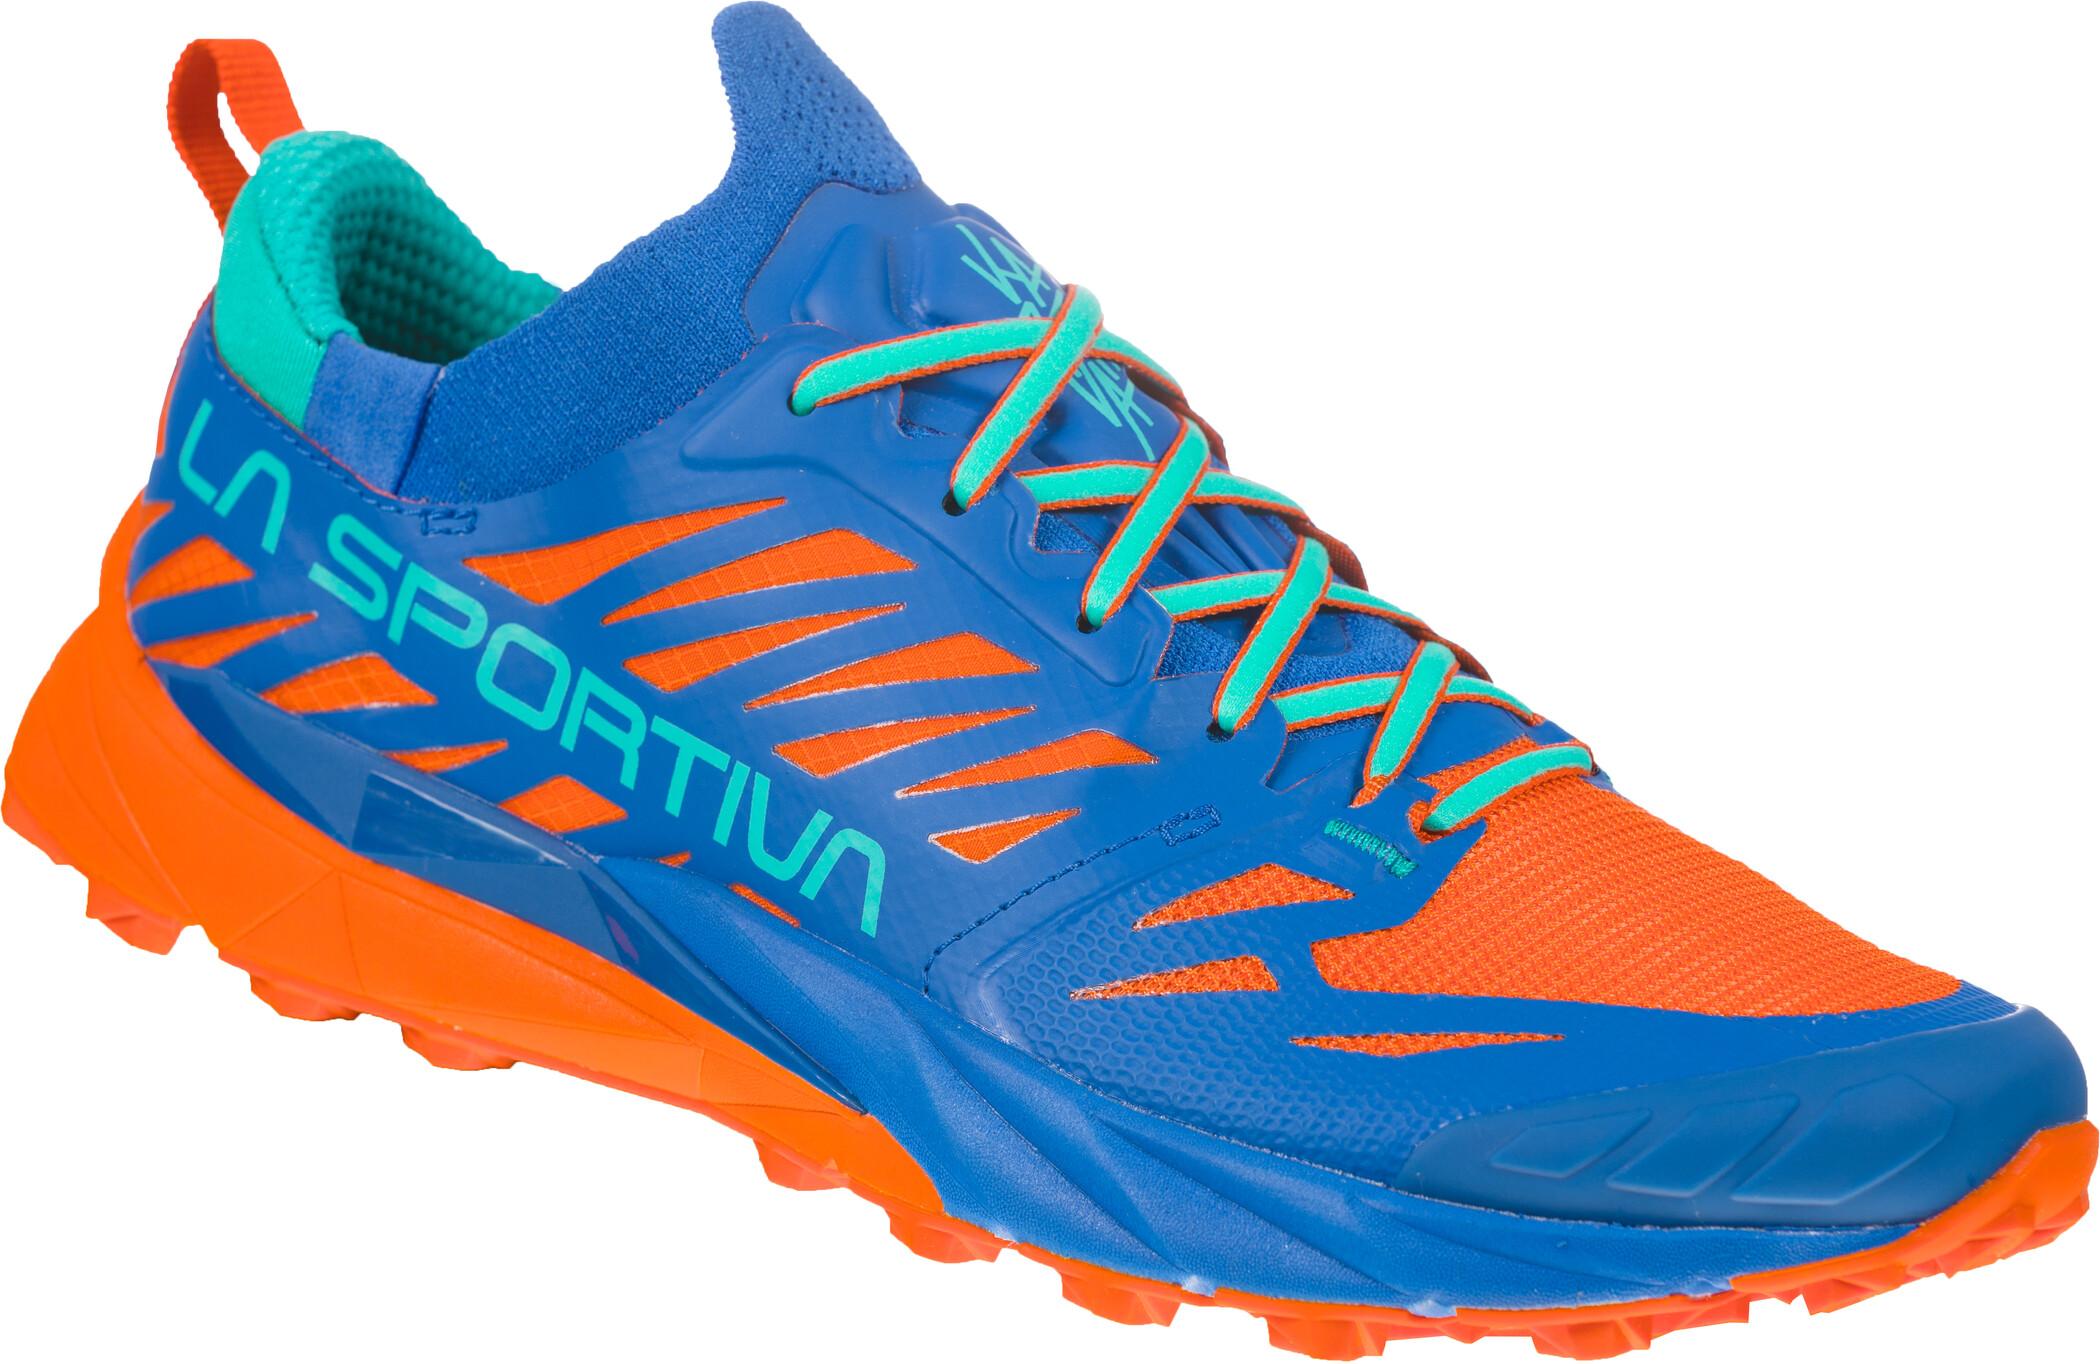 La Sportiva Kaptiva Running Shoes Dam marine blueaqua